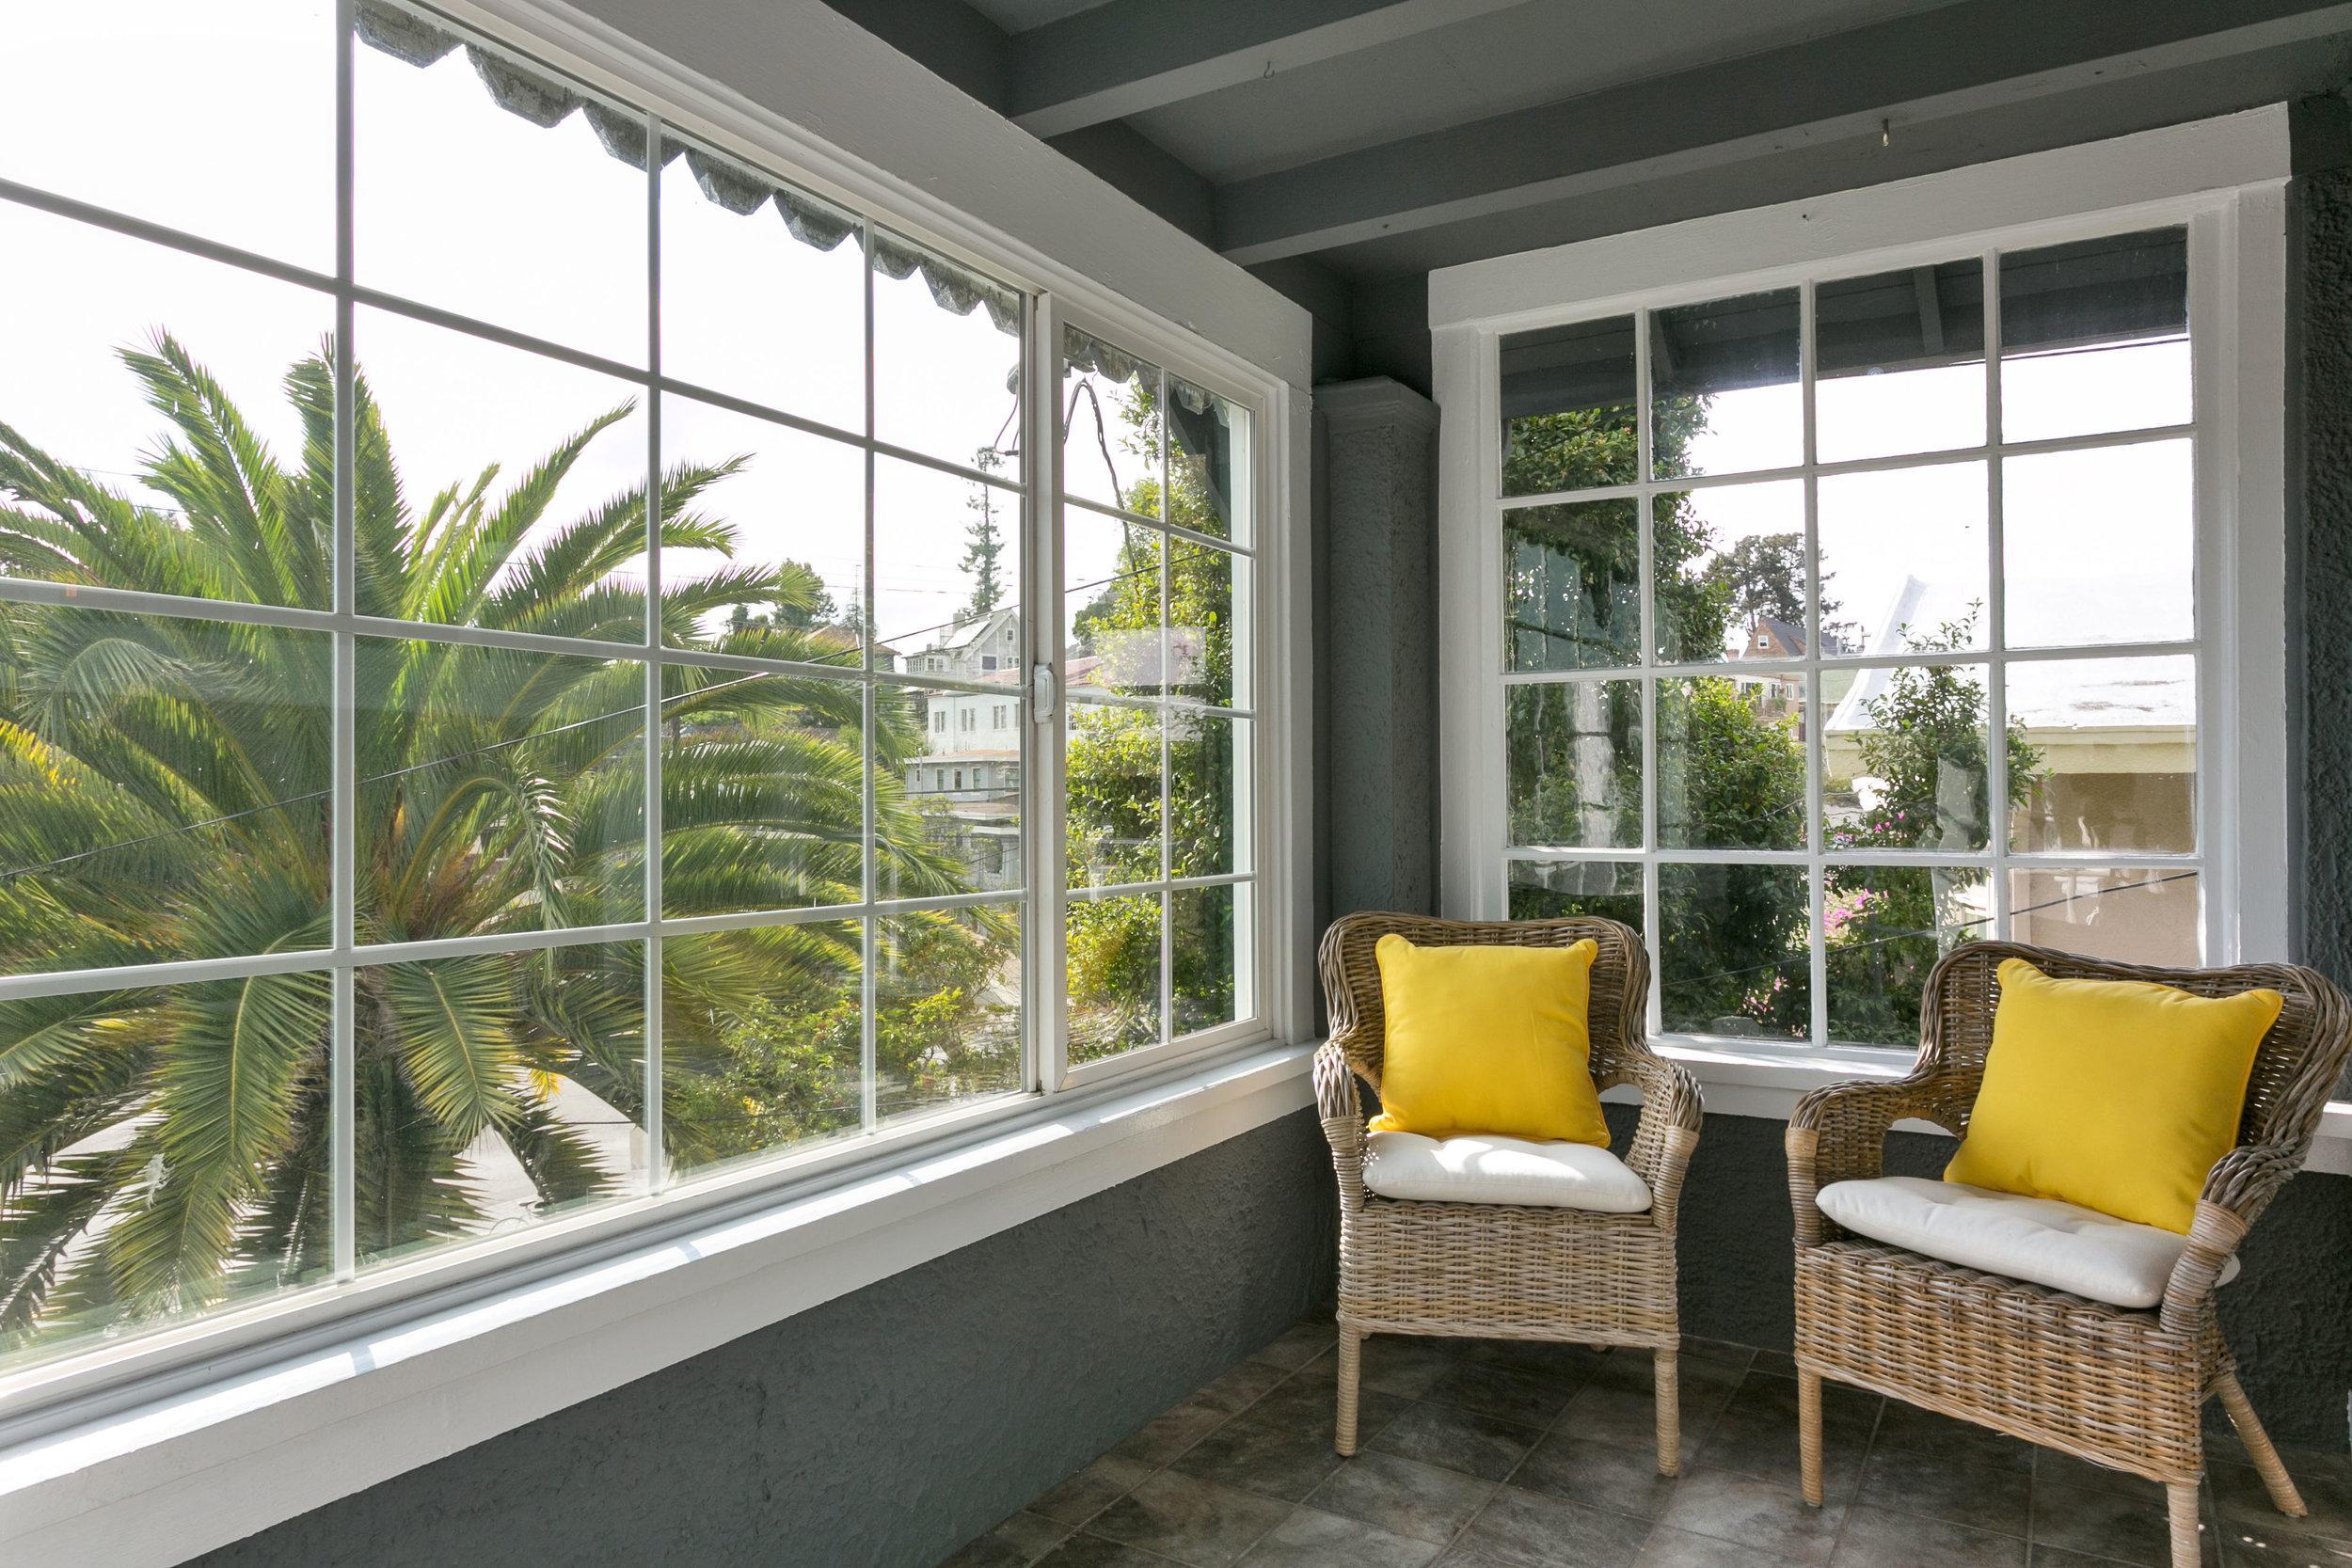 03 Front sun porch.jpg